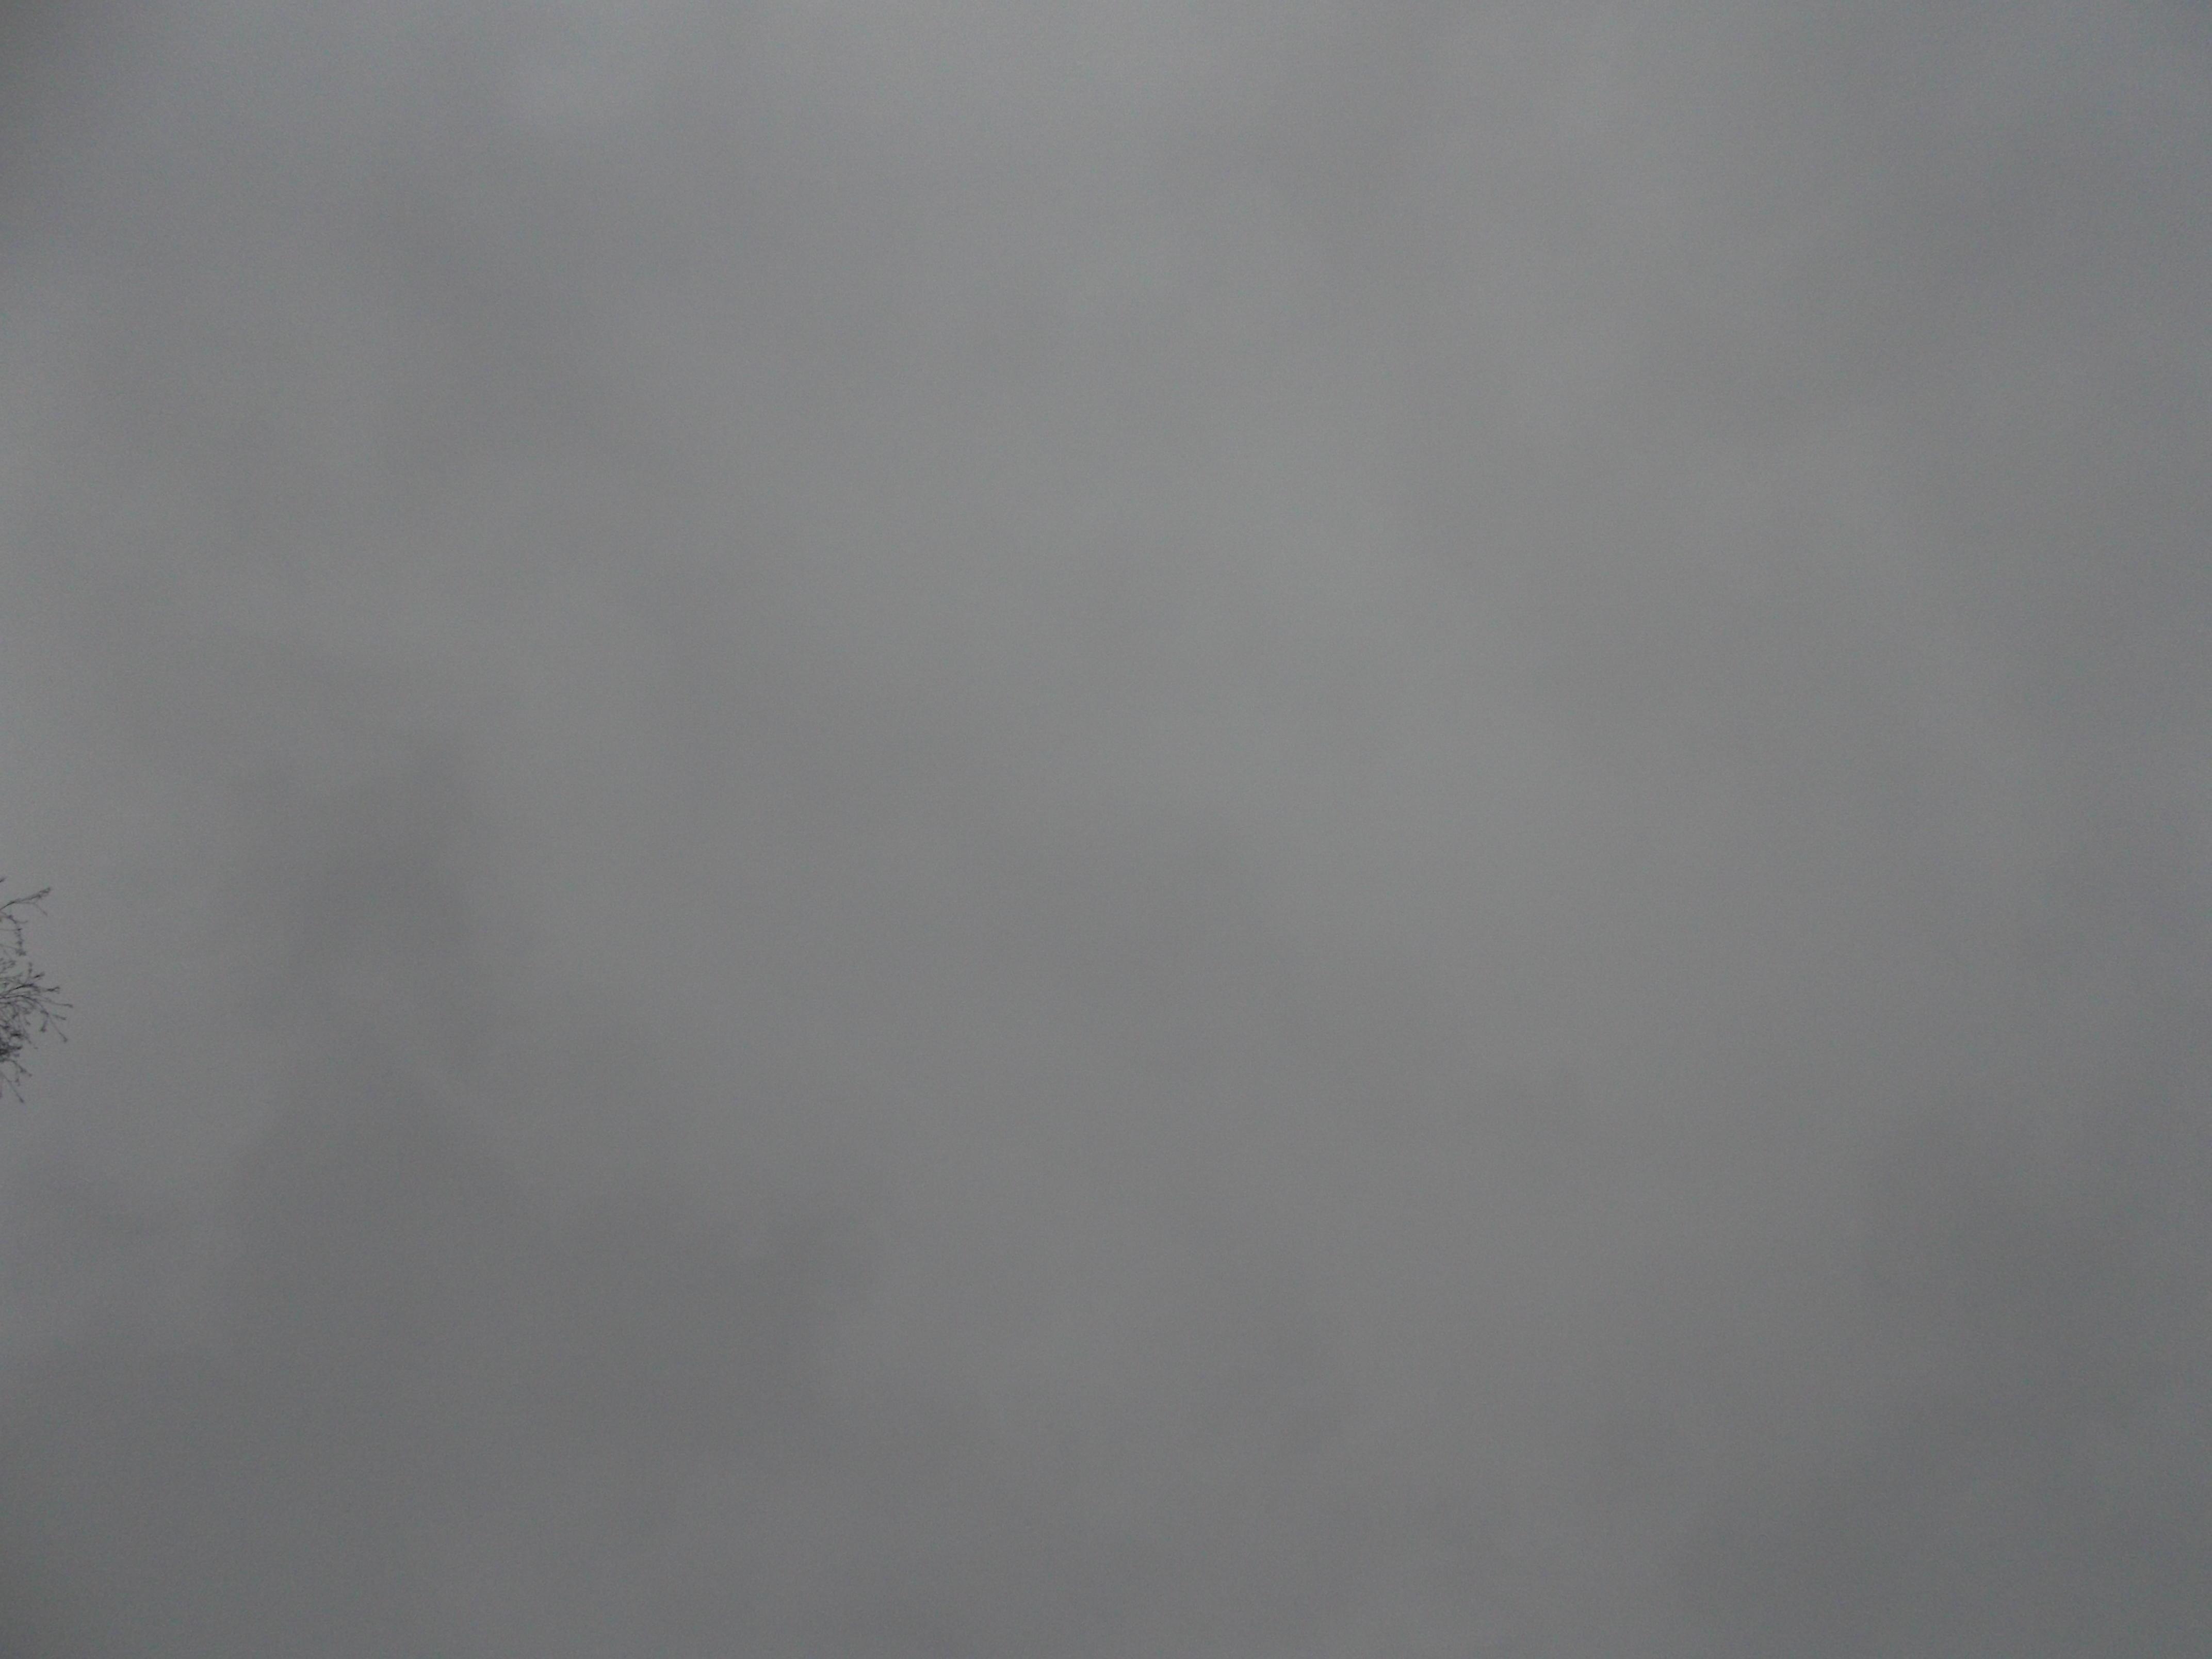 2013-01-03 Longitude -0.371 Latitude 49.182 Altitude 13 Heure 14h39